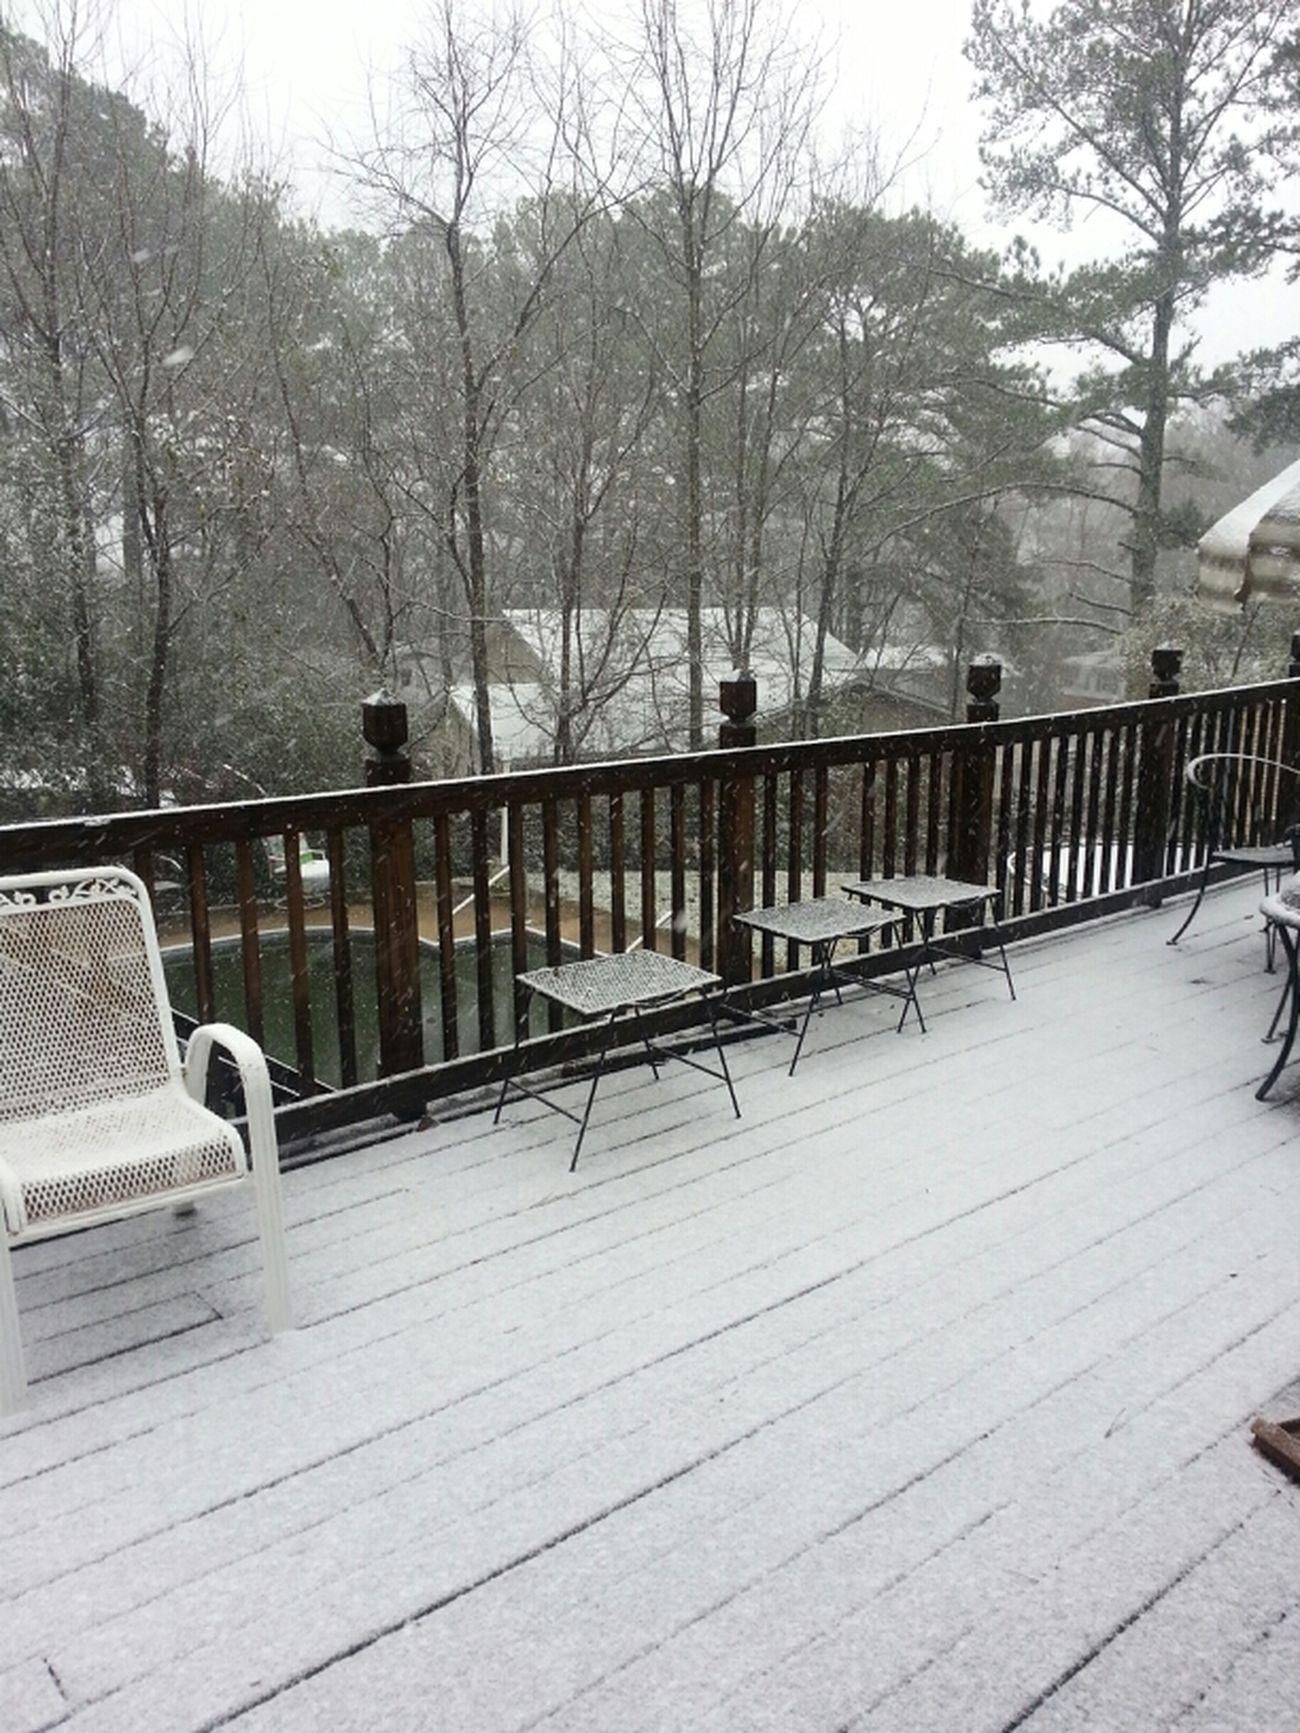 Snow day in B'ham